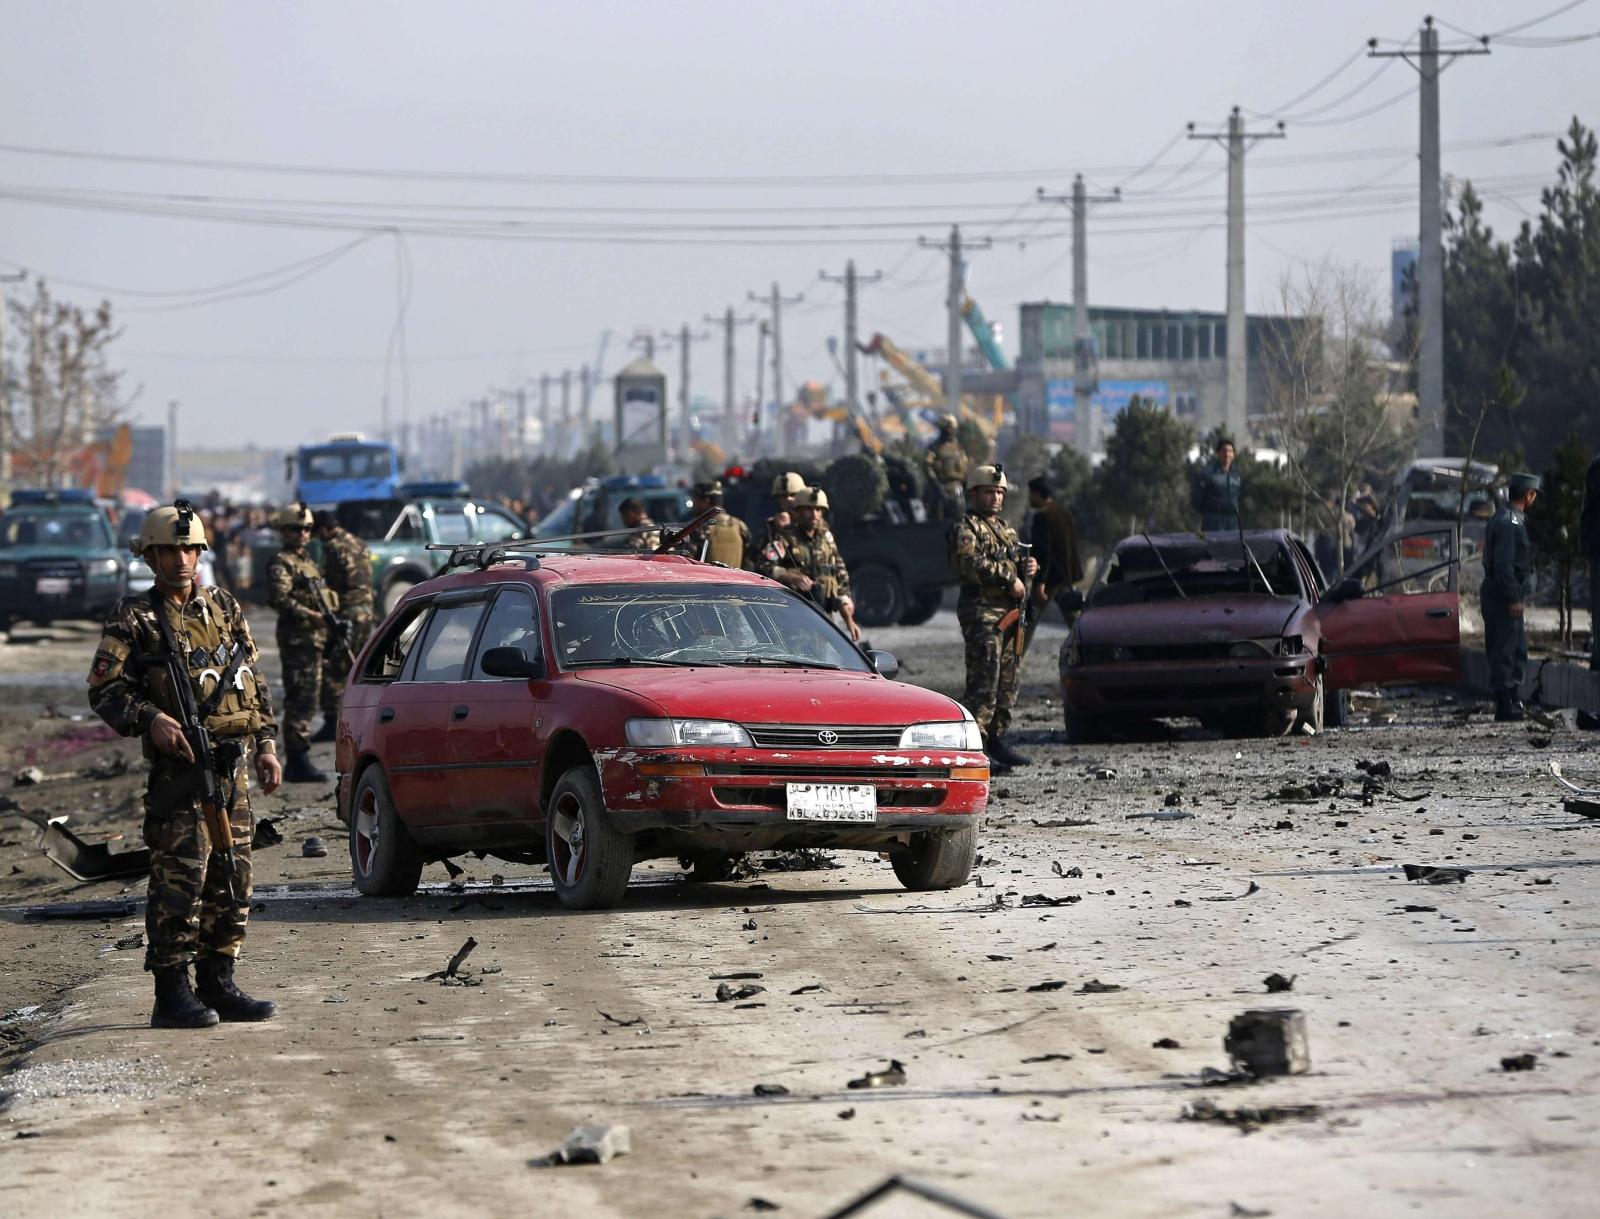 British Embassy Car Blasted by Bomb in Kabul Killing Four